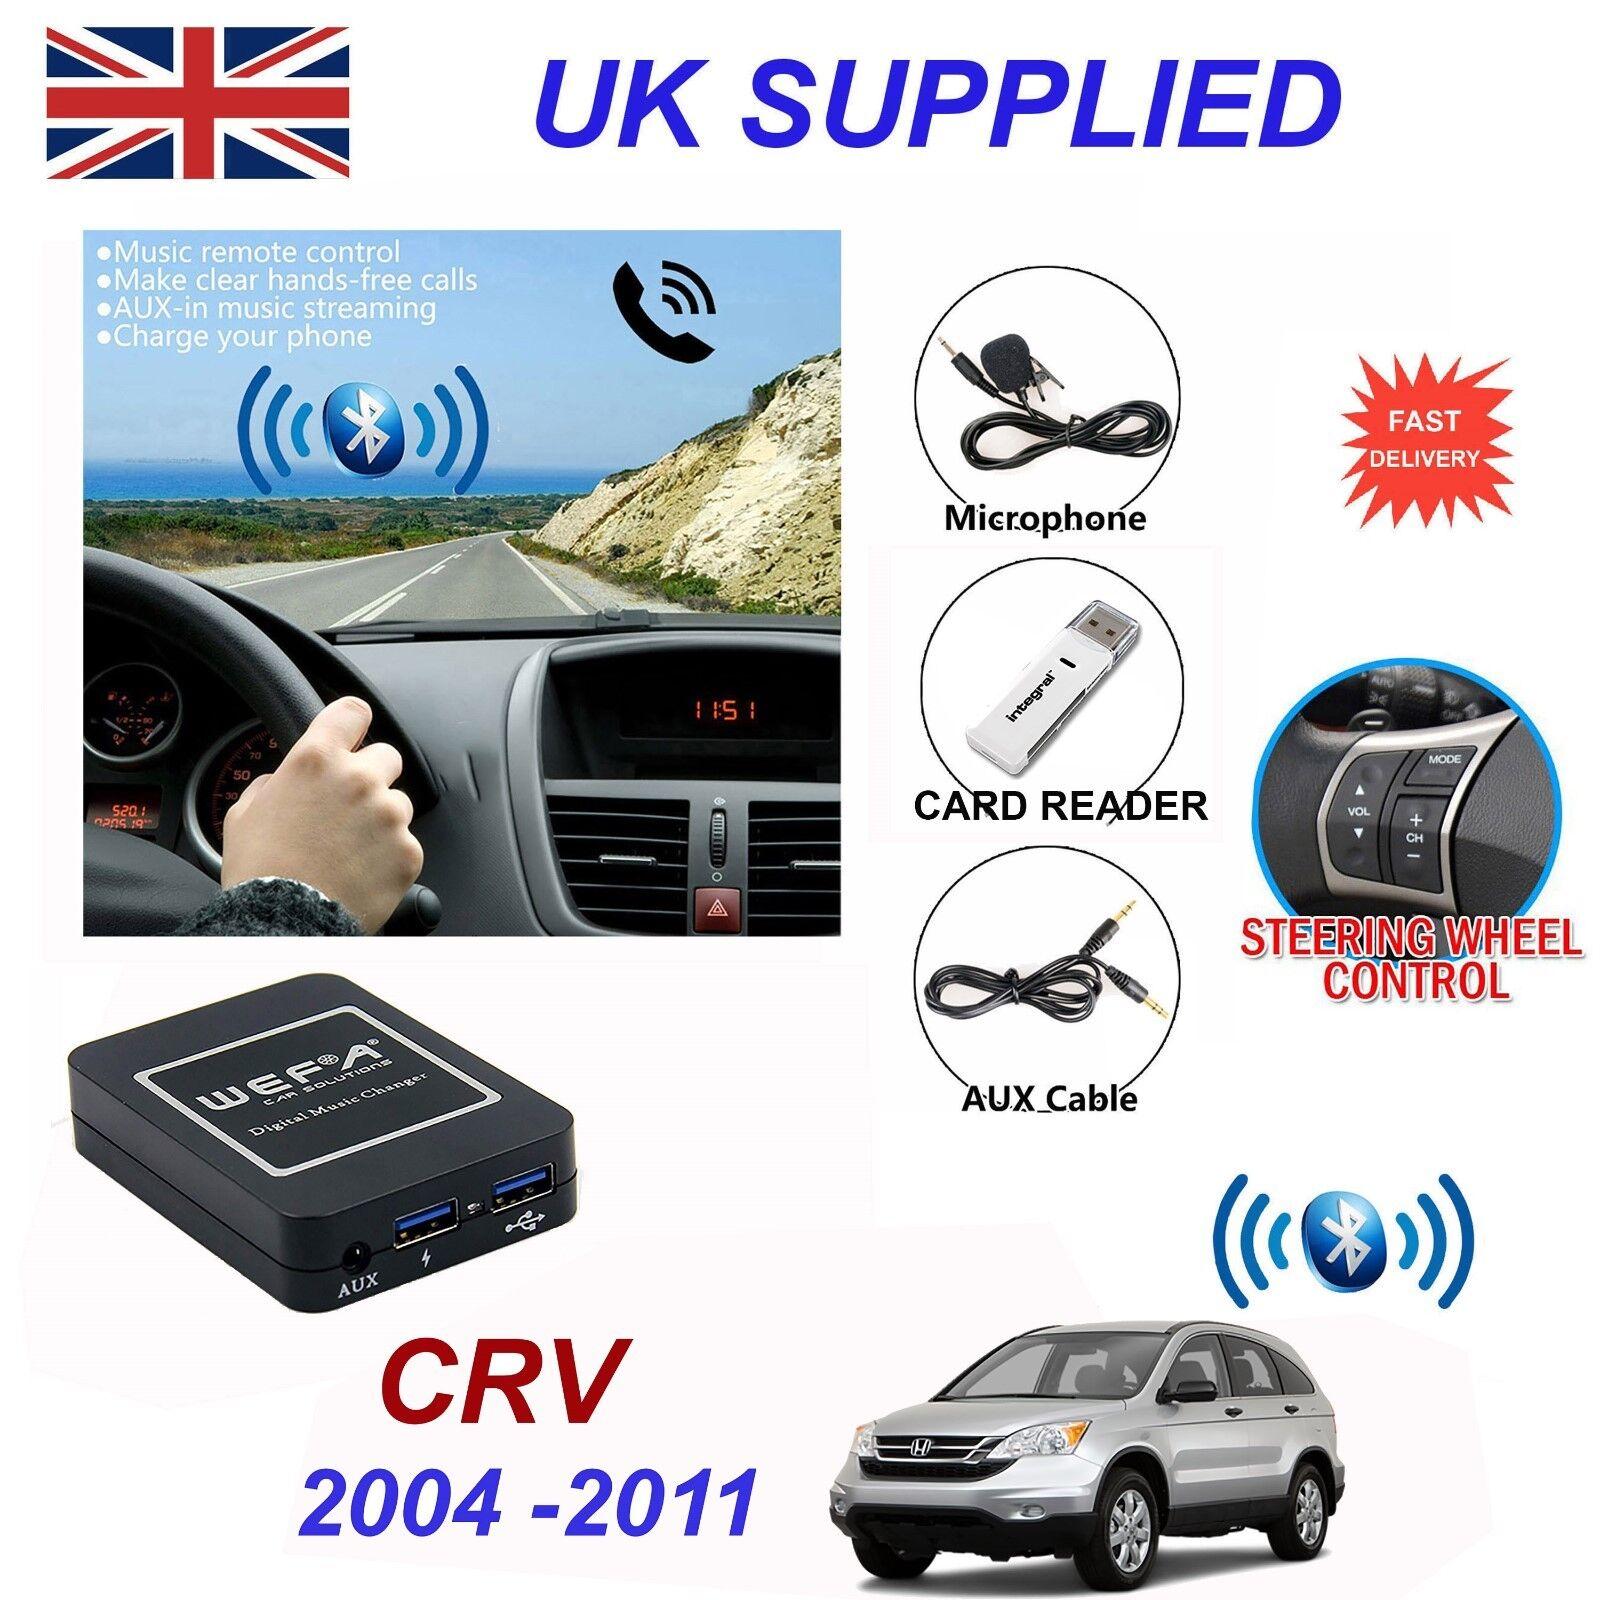 Honda CRV Bluetooth Hands Free Phone AUX Input MP3 2xUSB Charger Module 2.4